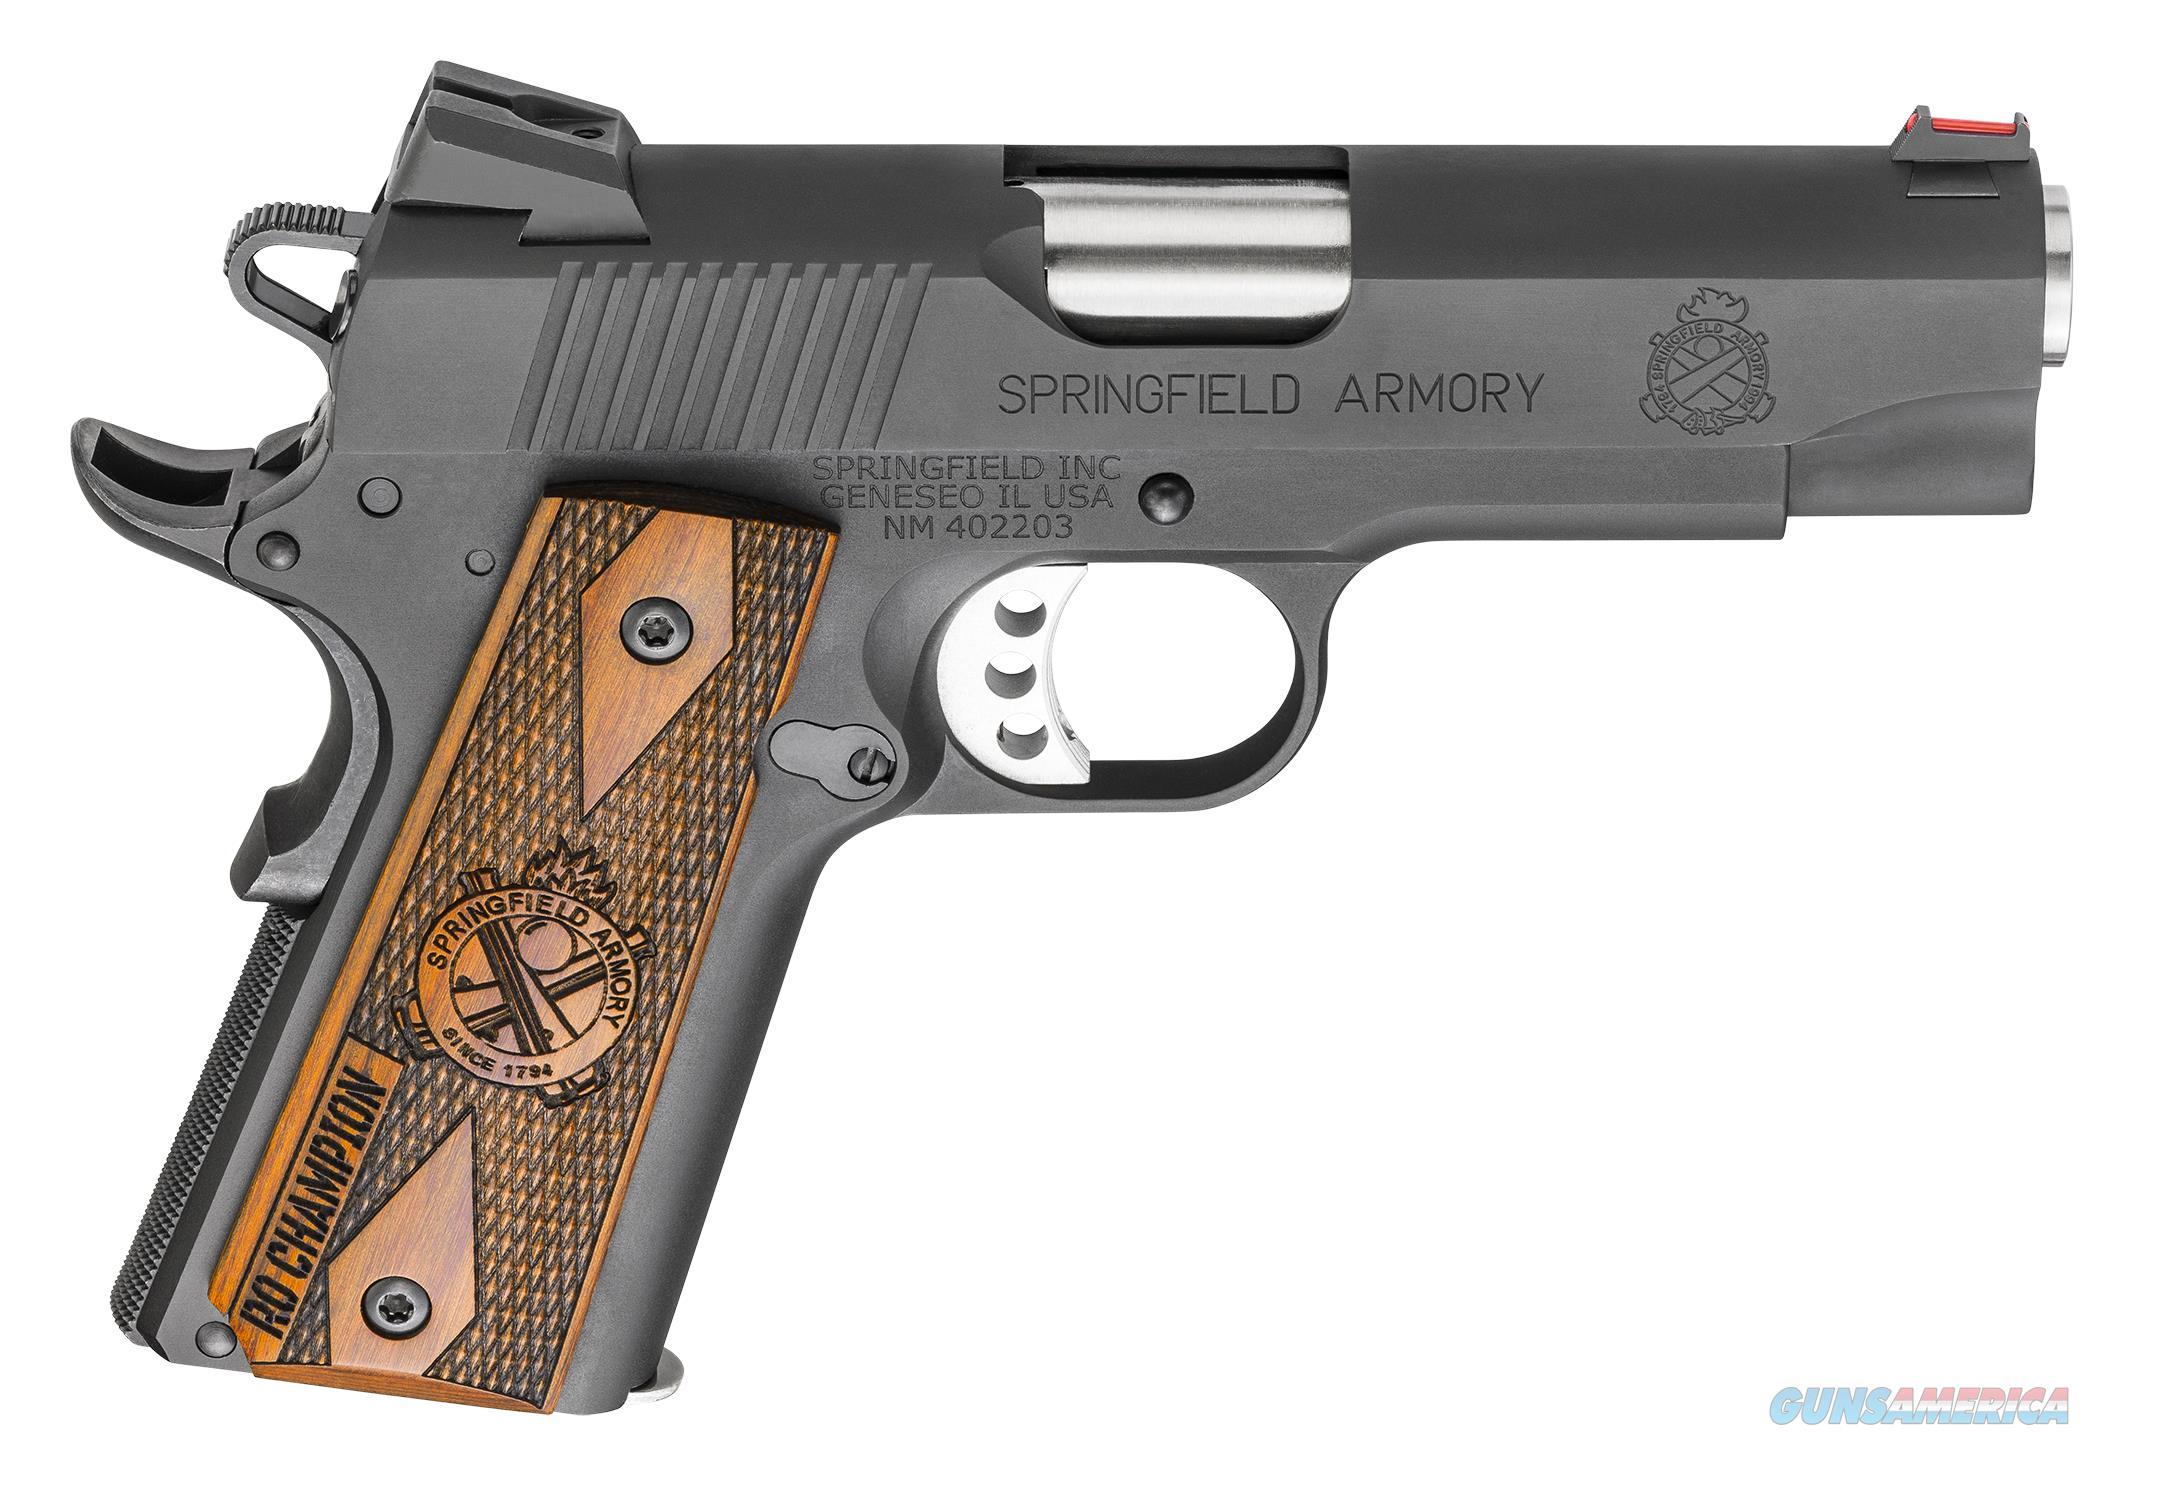 "Springfield Armory 1911 Range Officer .45 ACP 4"" PI9136L   Guns > Pistols > Springfield Armory Pistols > 1911 Type"